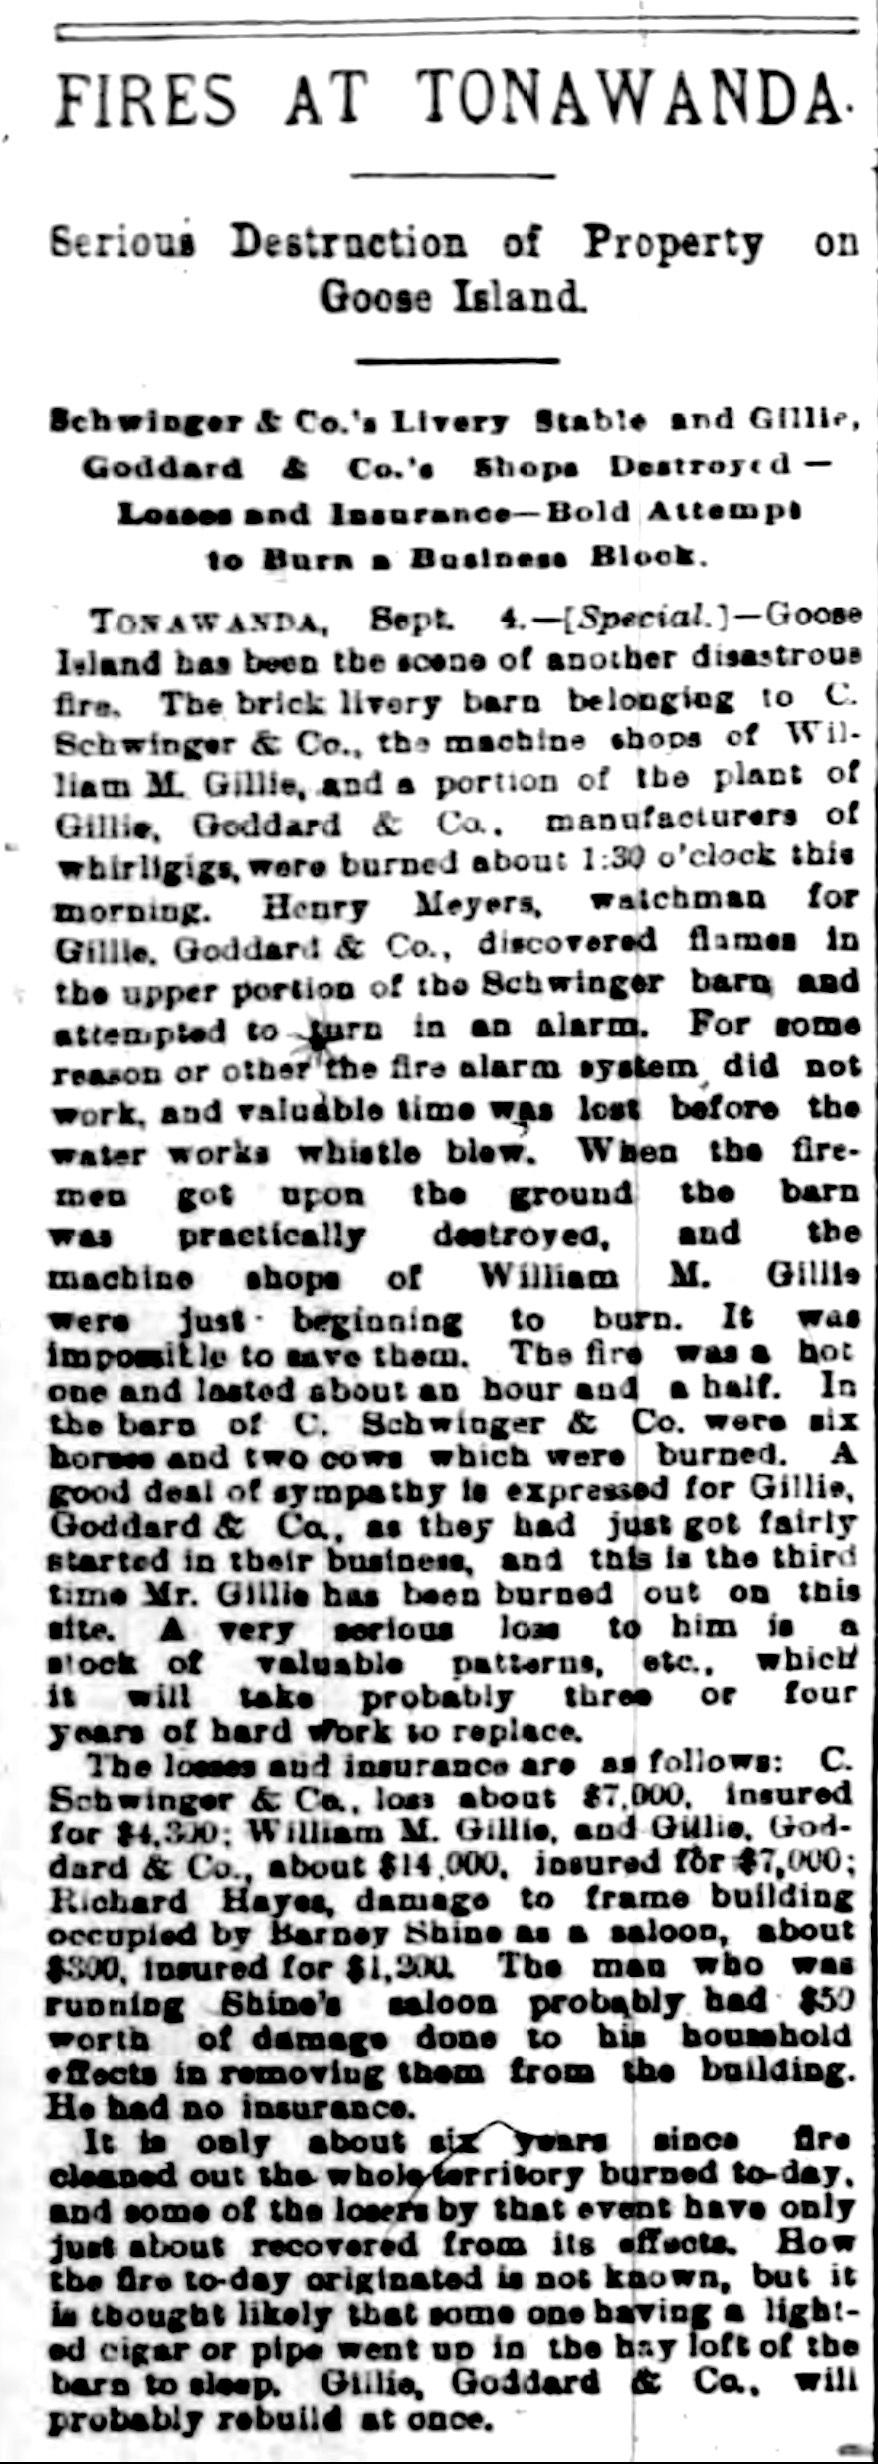 Fires at Tonawanda, Gillie, Goodard, Schwinger destroyed, article (Buffalo Courier, 1892-09-05).jpg